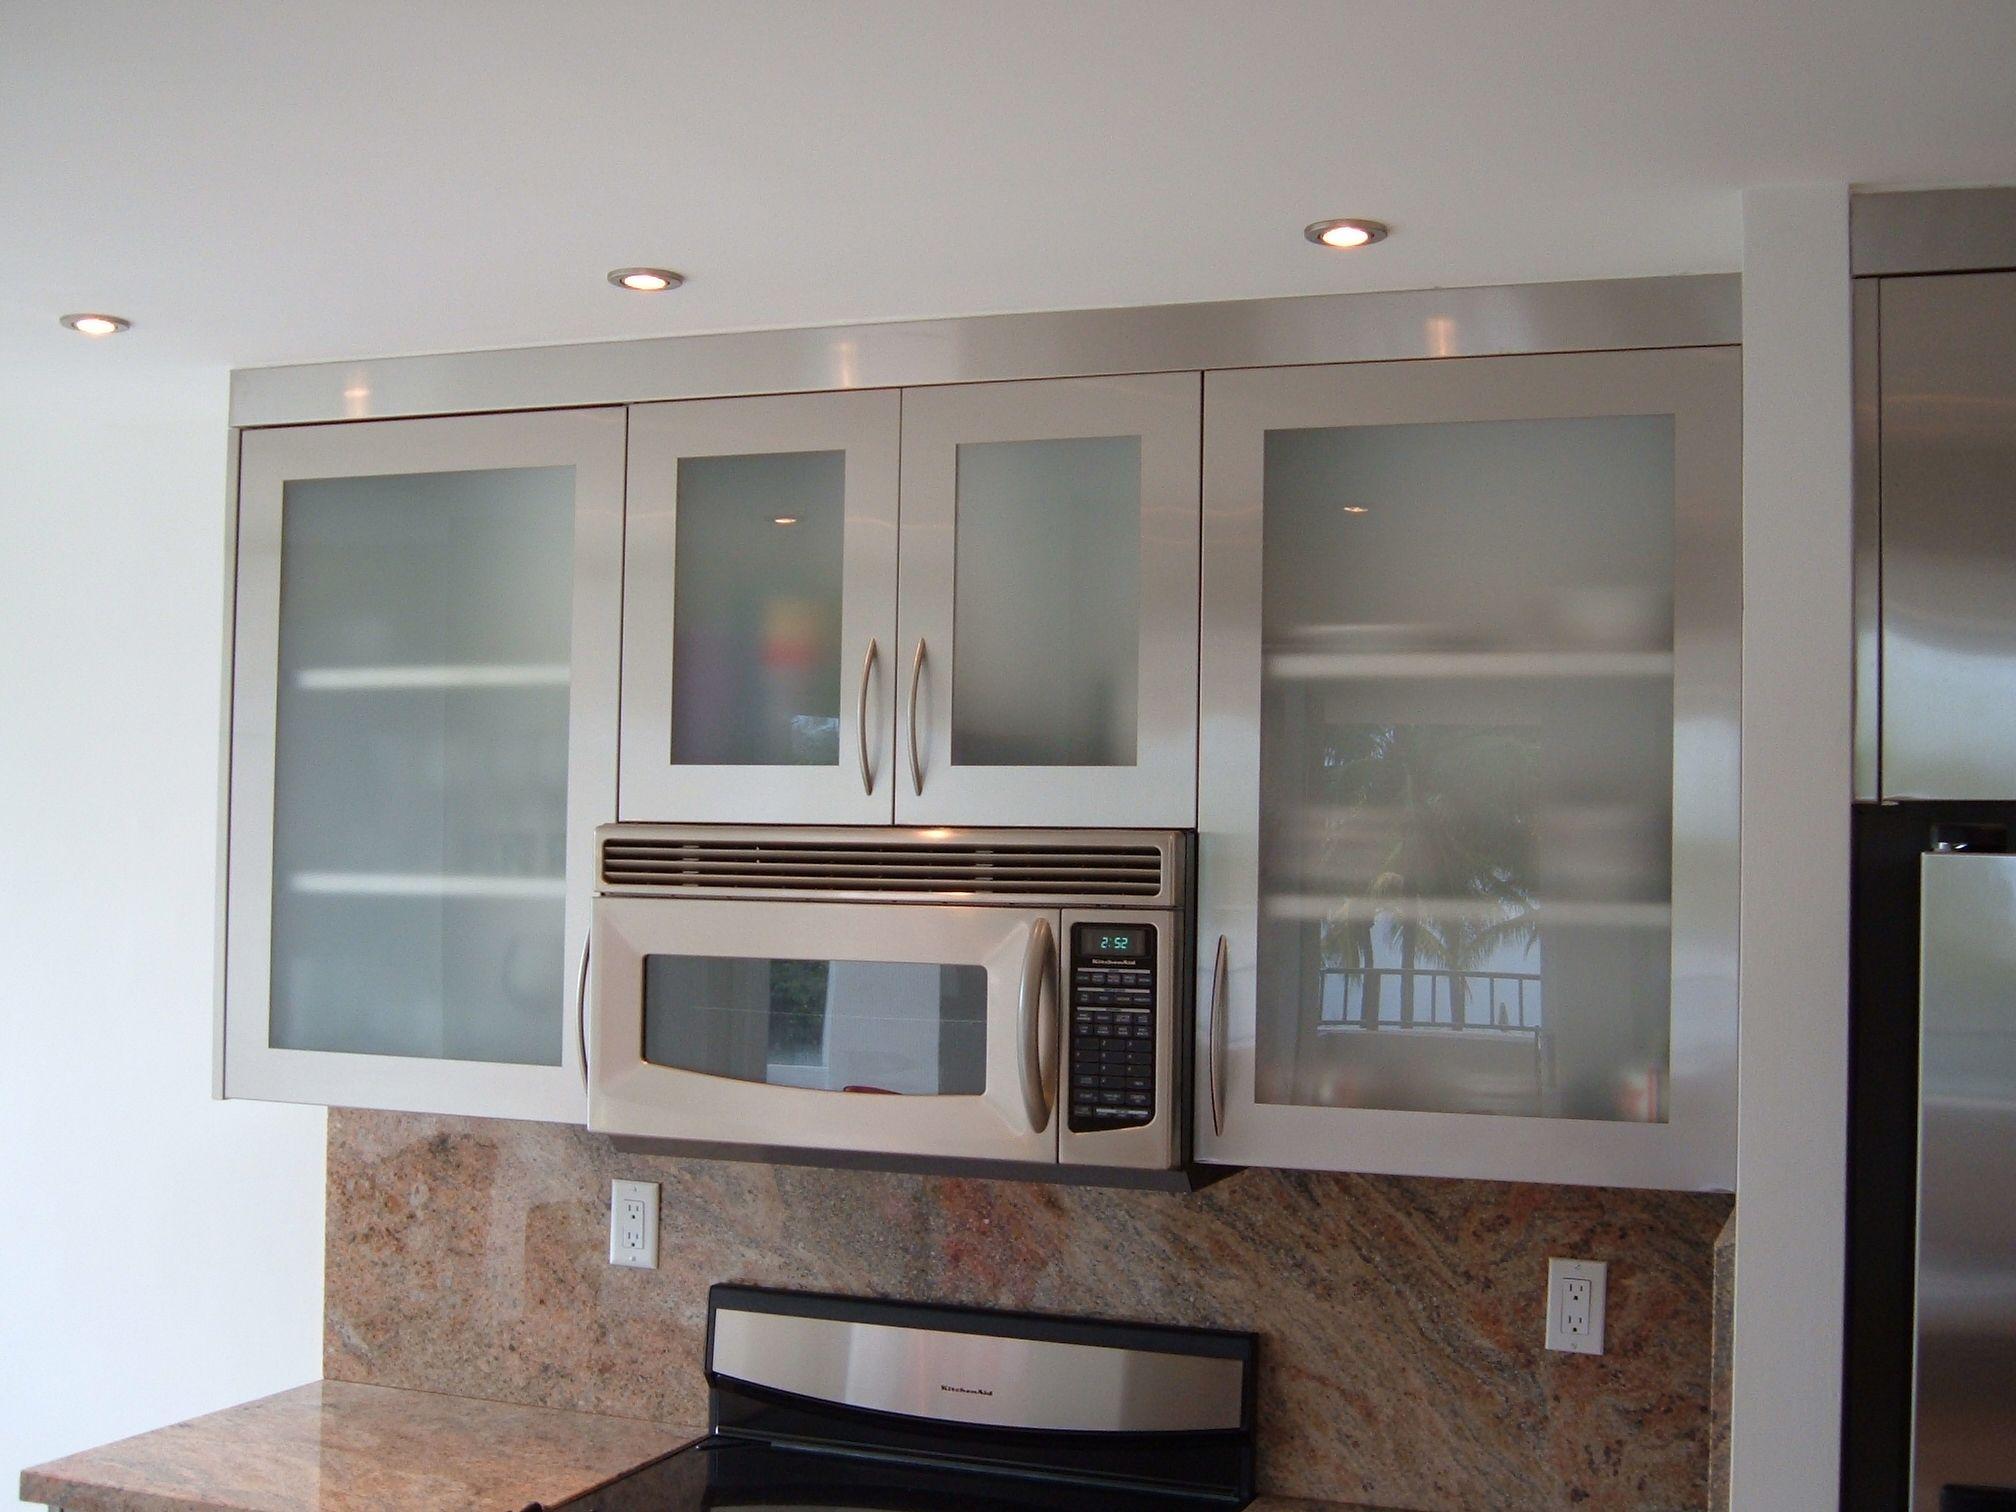 B & q küchenideen image result for built in glass cabinet  houzing  pinterest